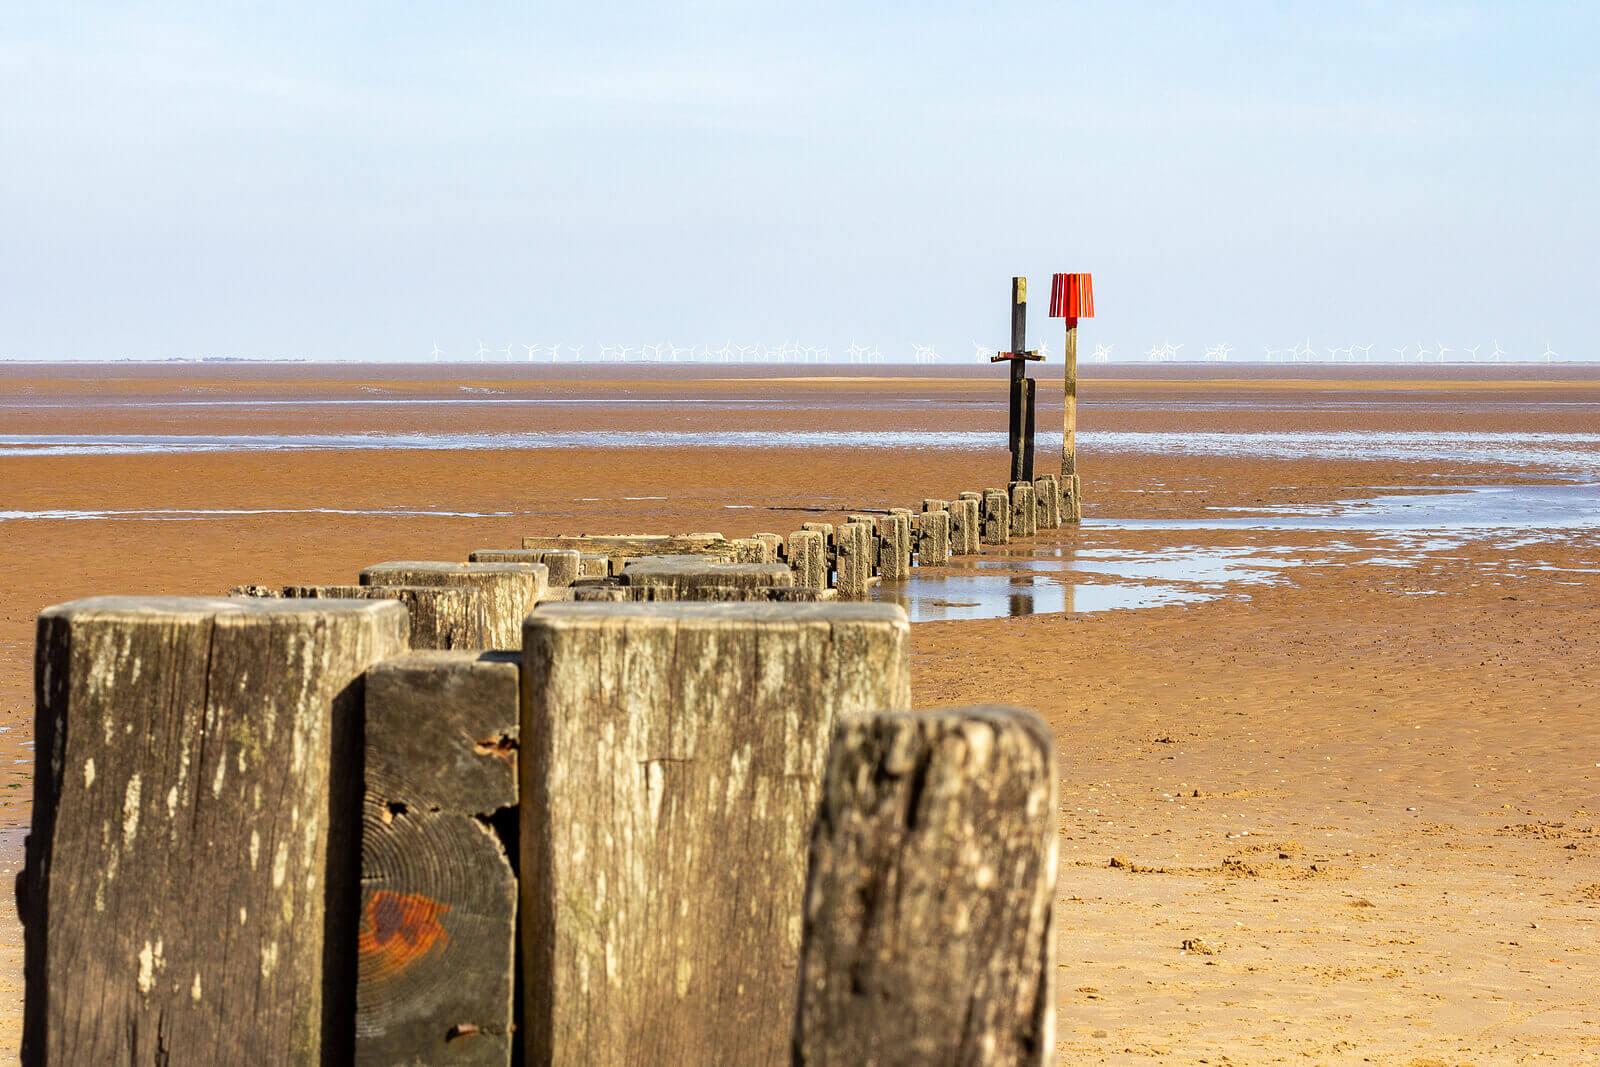 Wooden groynes on Cleethorpes sandy beach